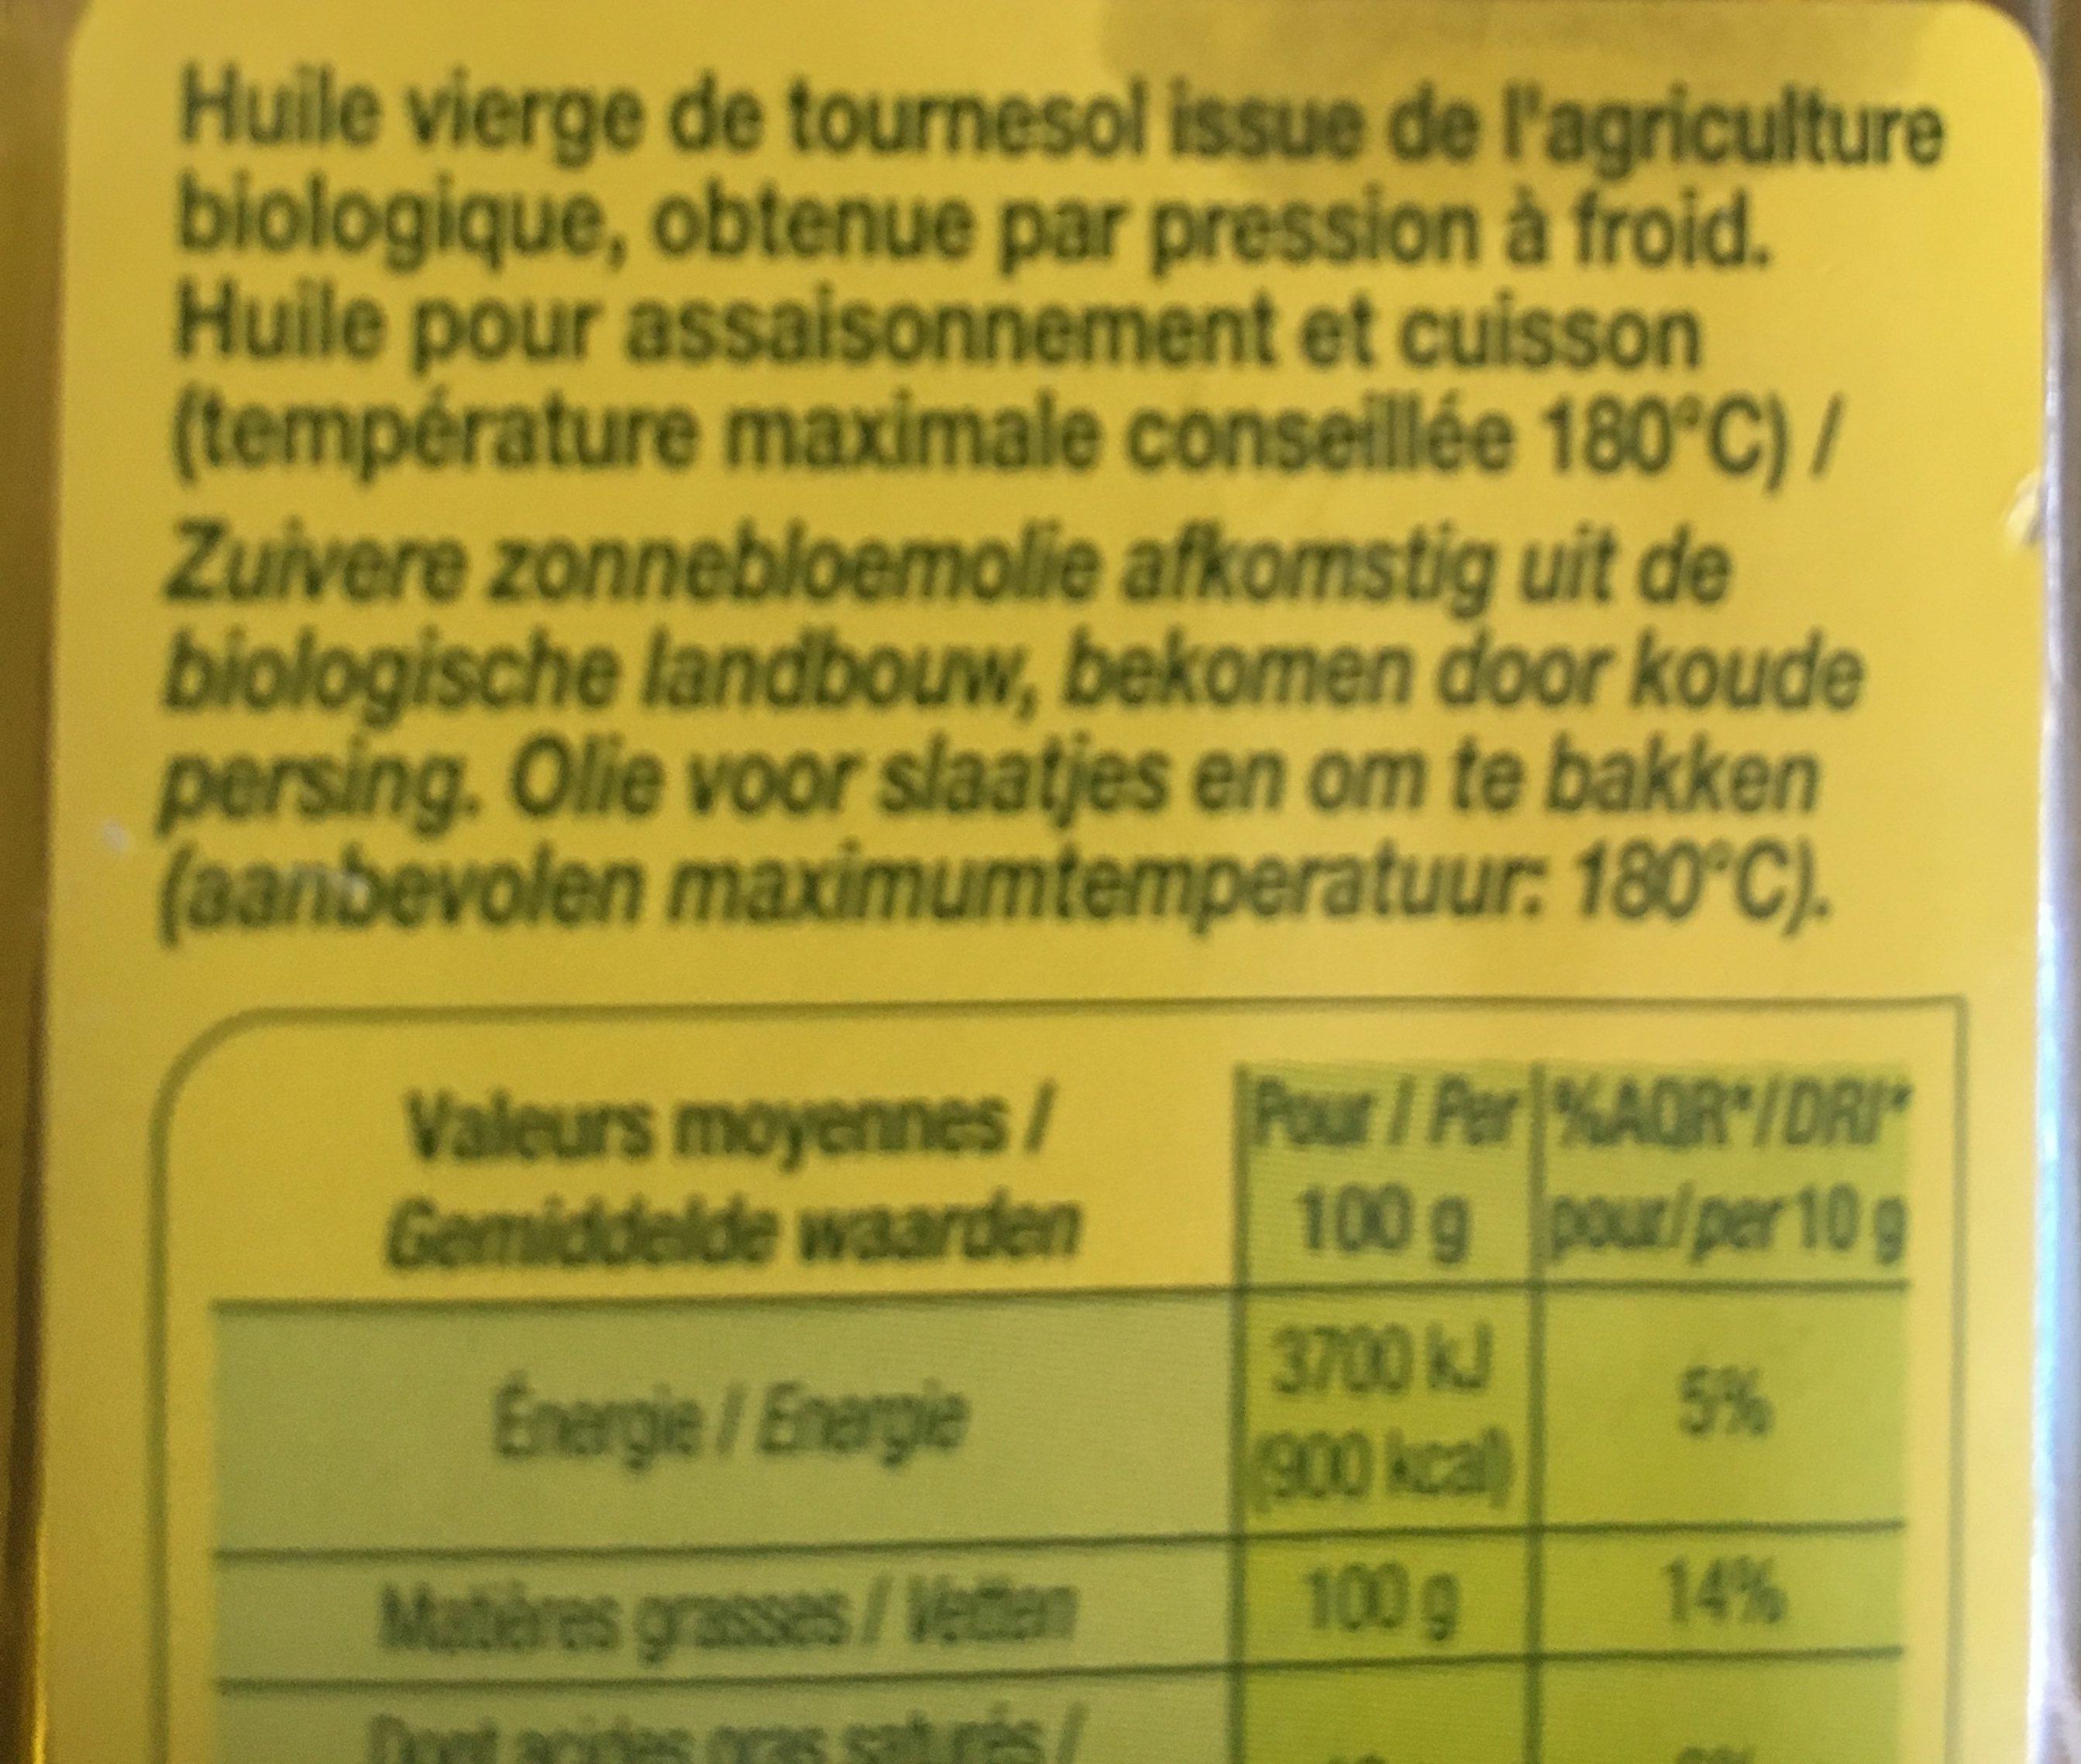 Huile Vierge De Tournesol - Derniers Stocks - Ingredients - fr